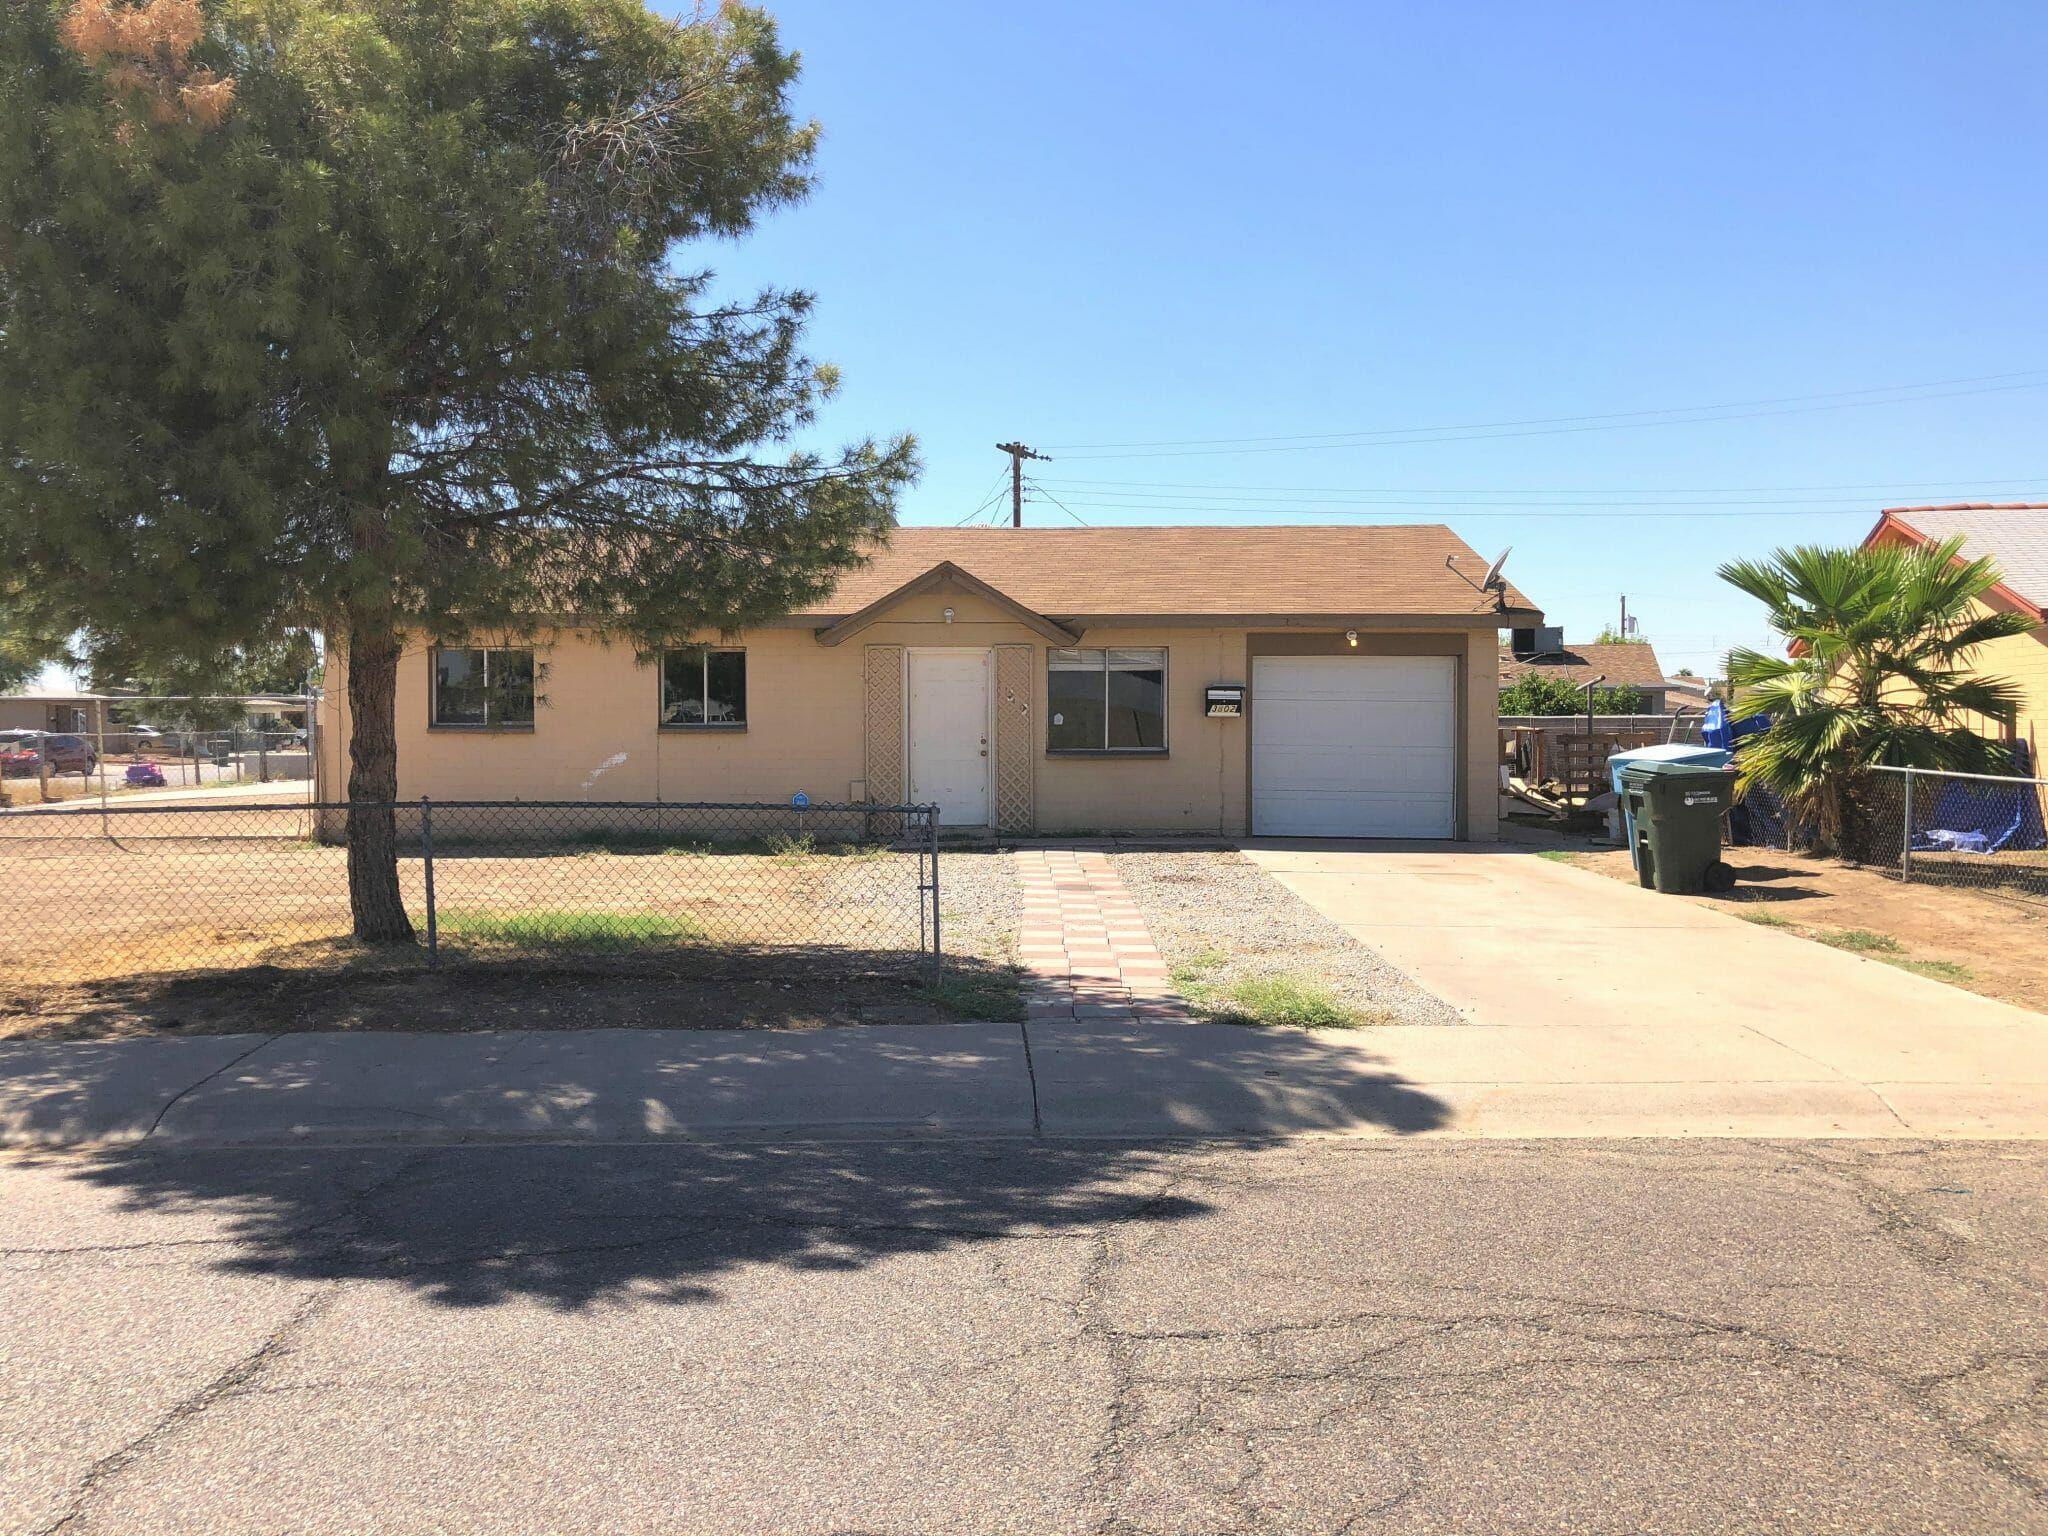 Arizona Wholesale Property 3802 N 80th Avenue Phoenix Az 85033 Home Family Arizona Outdoor Decor